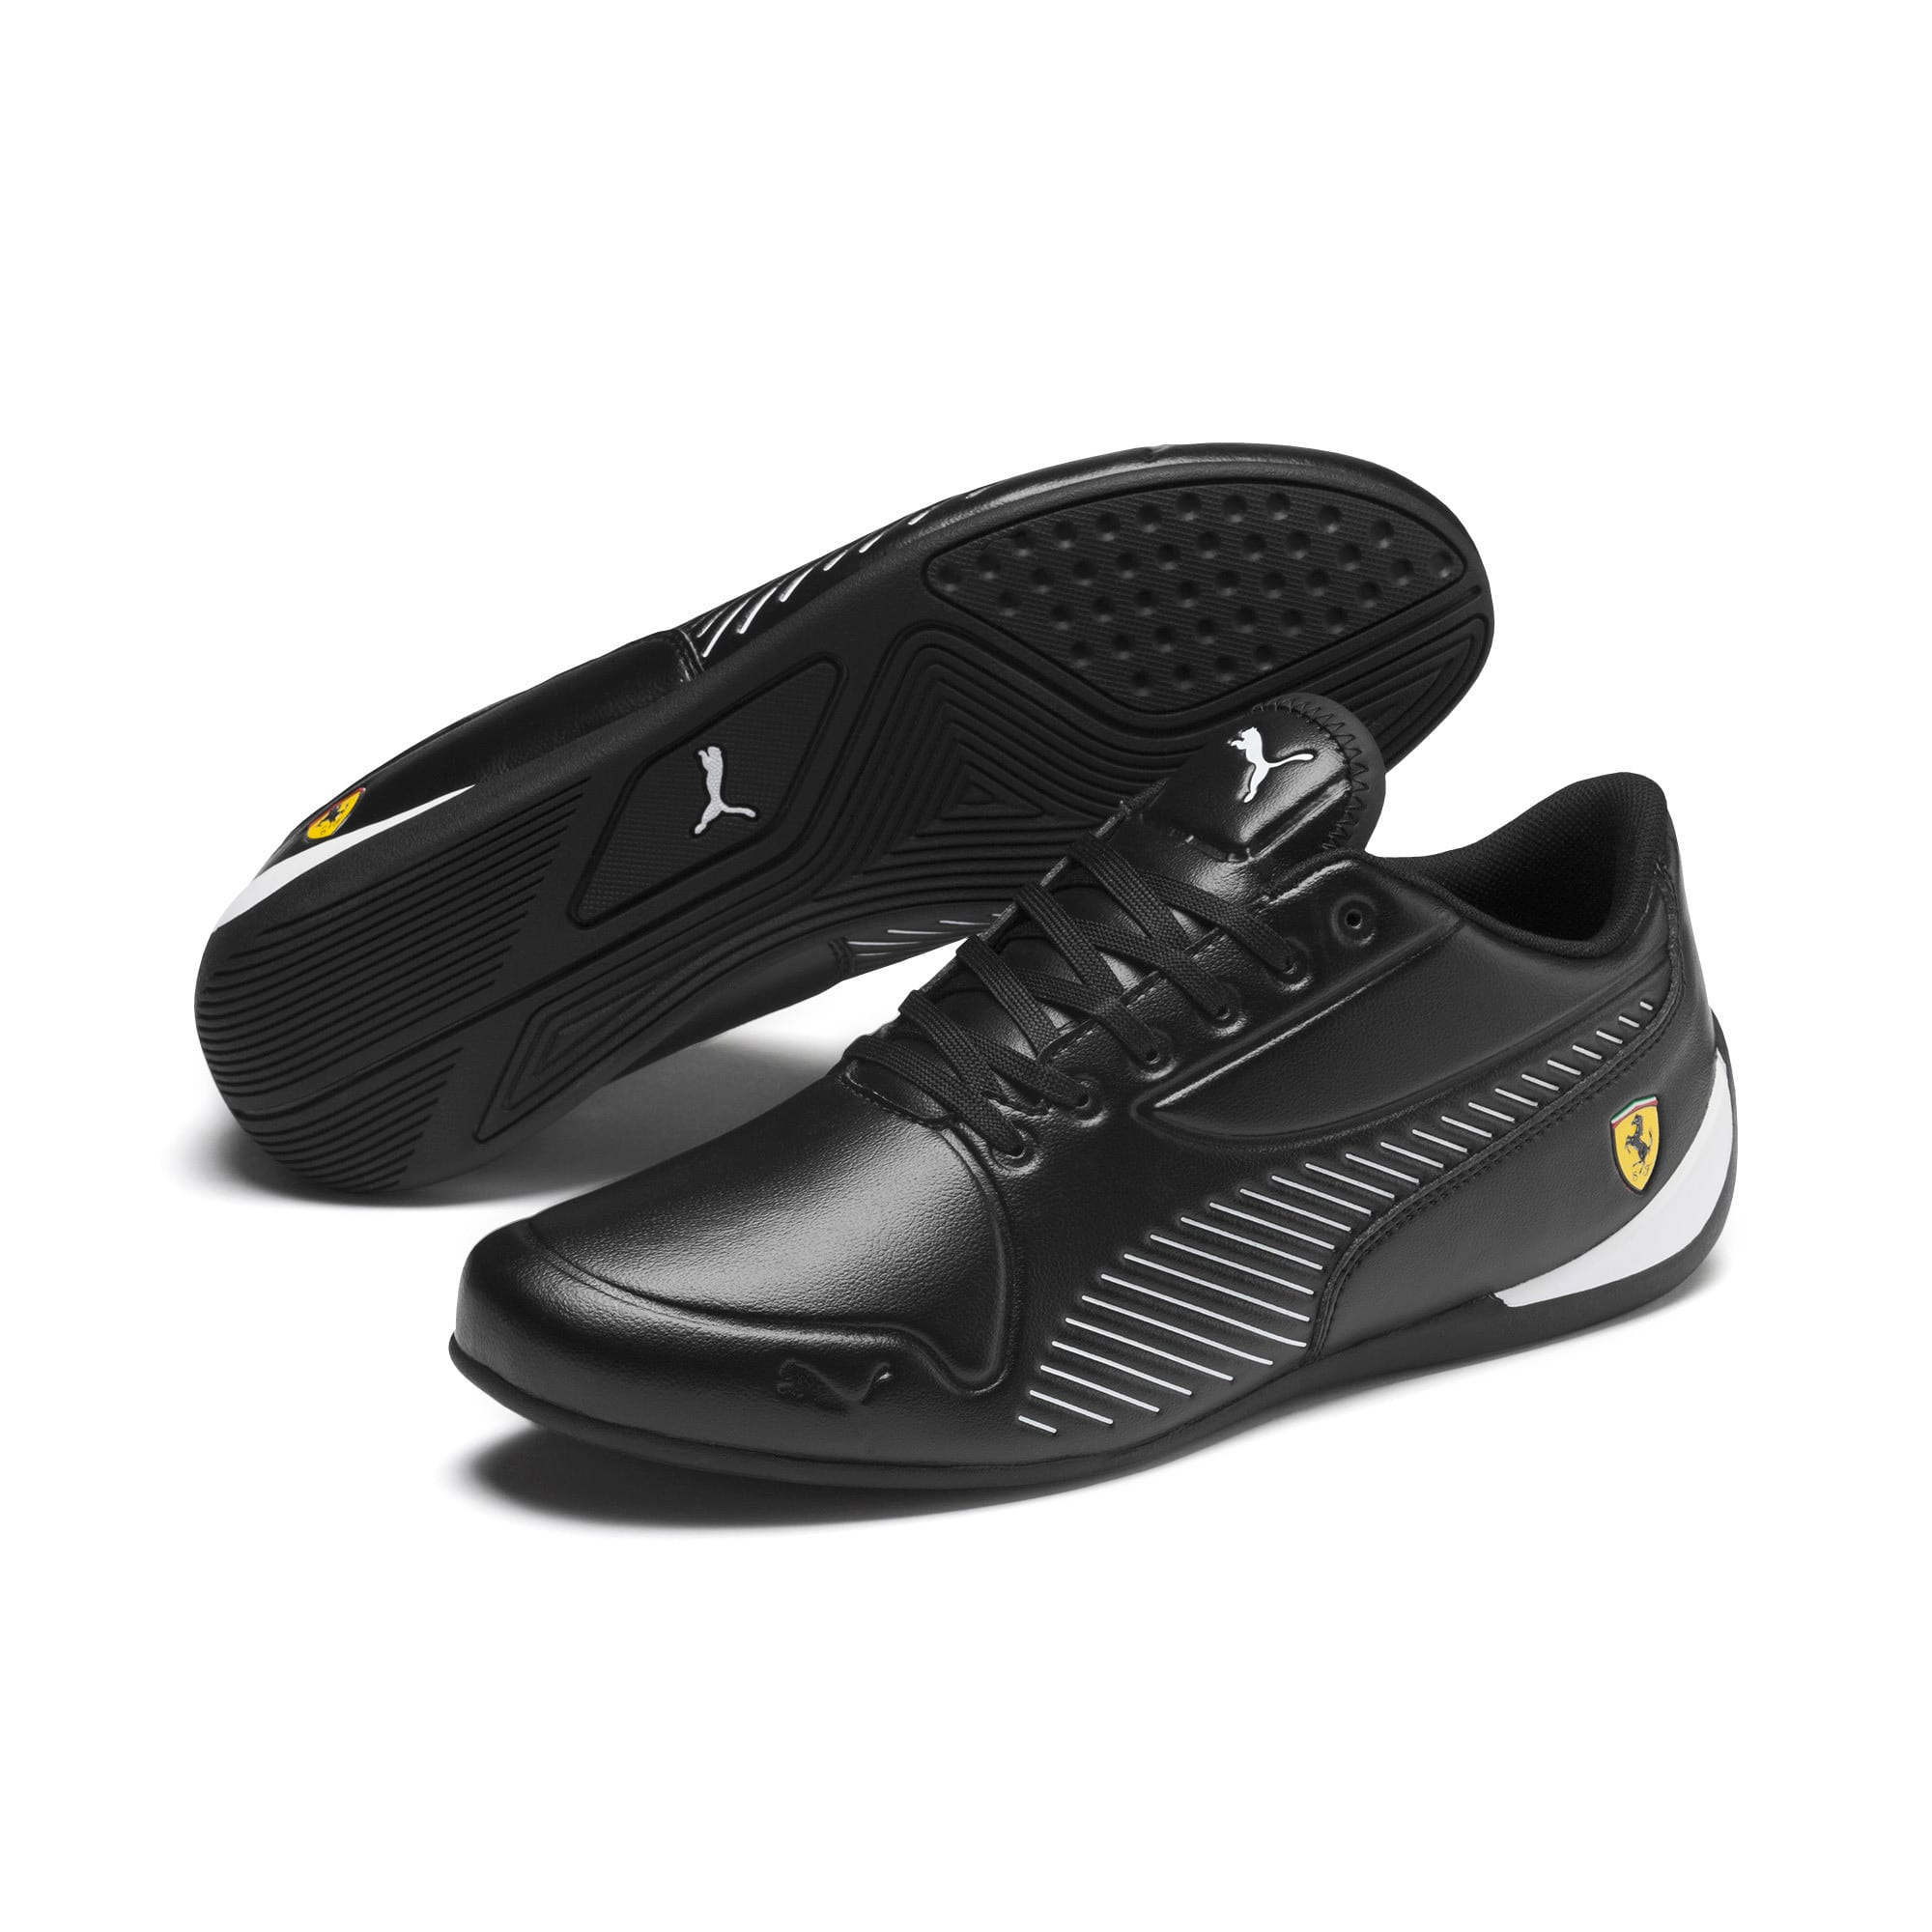 Thumbnail 3 of Scuderia Ferrari Drift Cat 7S Ultra Men's Shoes, Puma Black-Puma White, medium